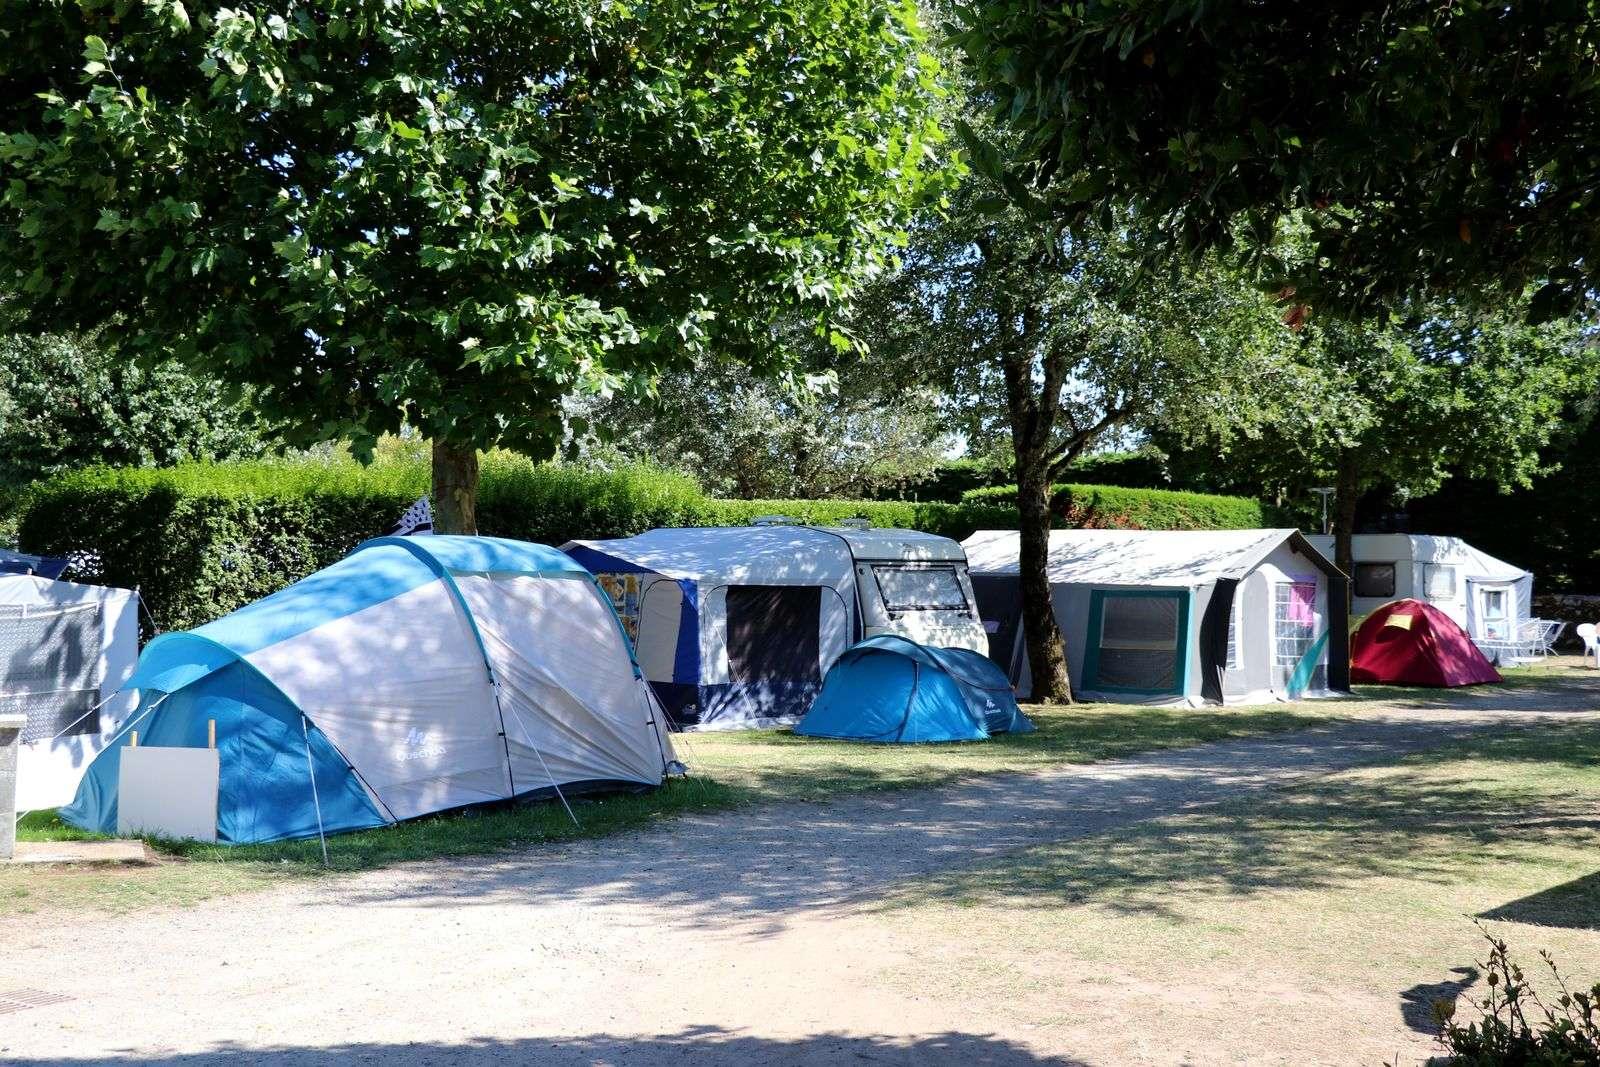 Emplacements tentes - Camping de Kersily - Plouharnel - Morbihan Bretagne Sud